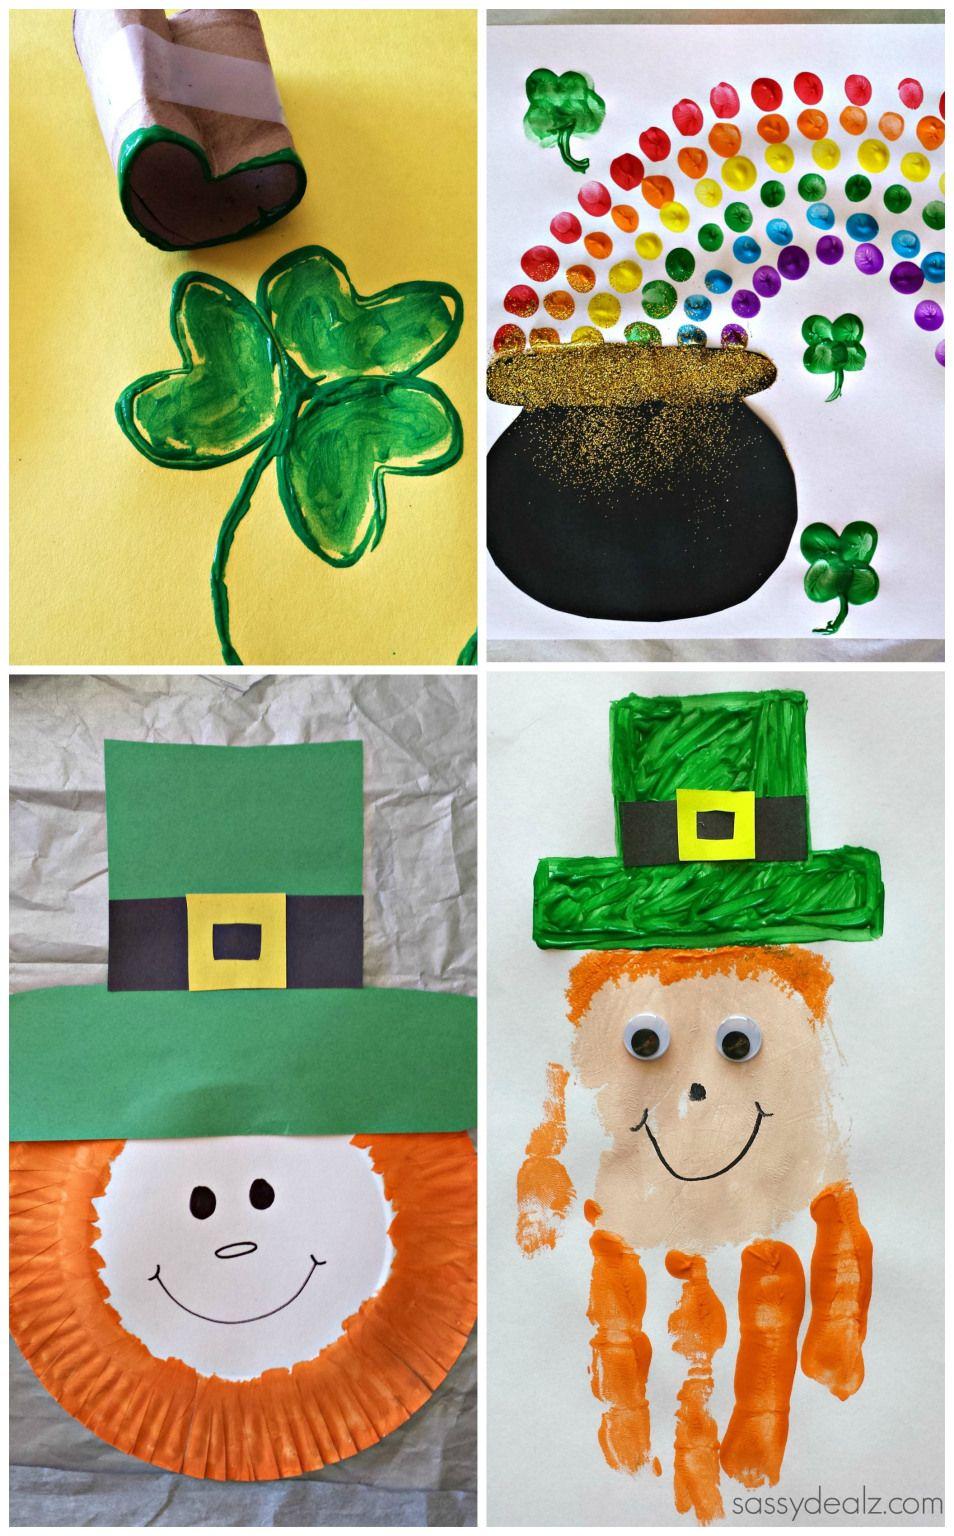 Easy St Patrick S Day Crafts For Kids Sassy Dealz St Patrick S